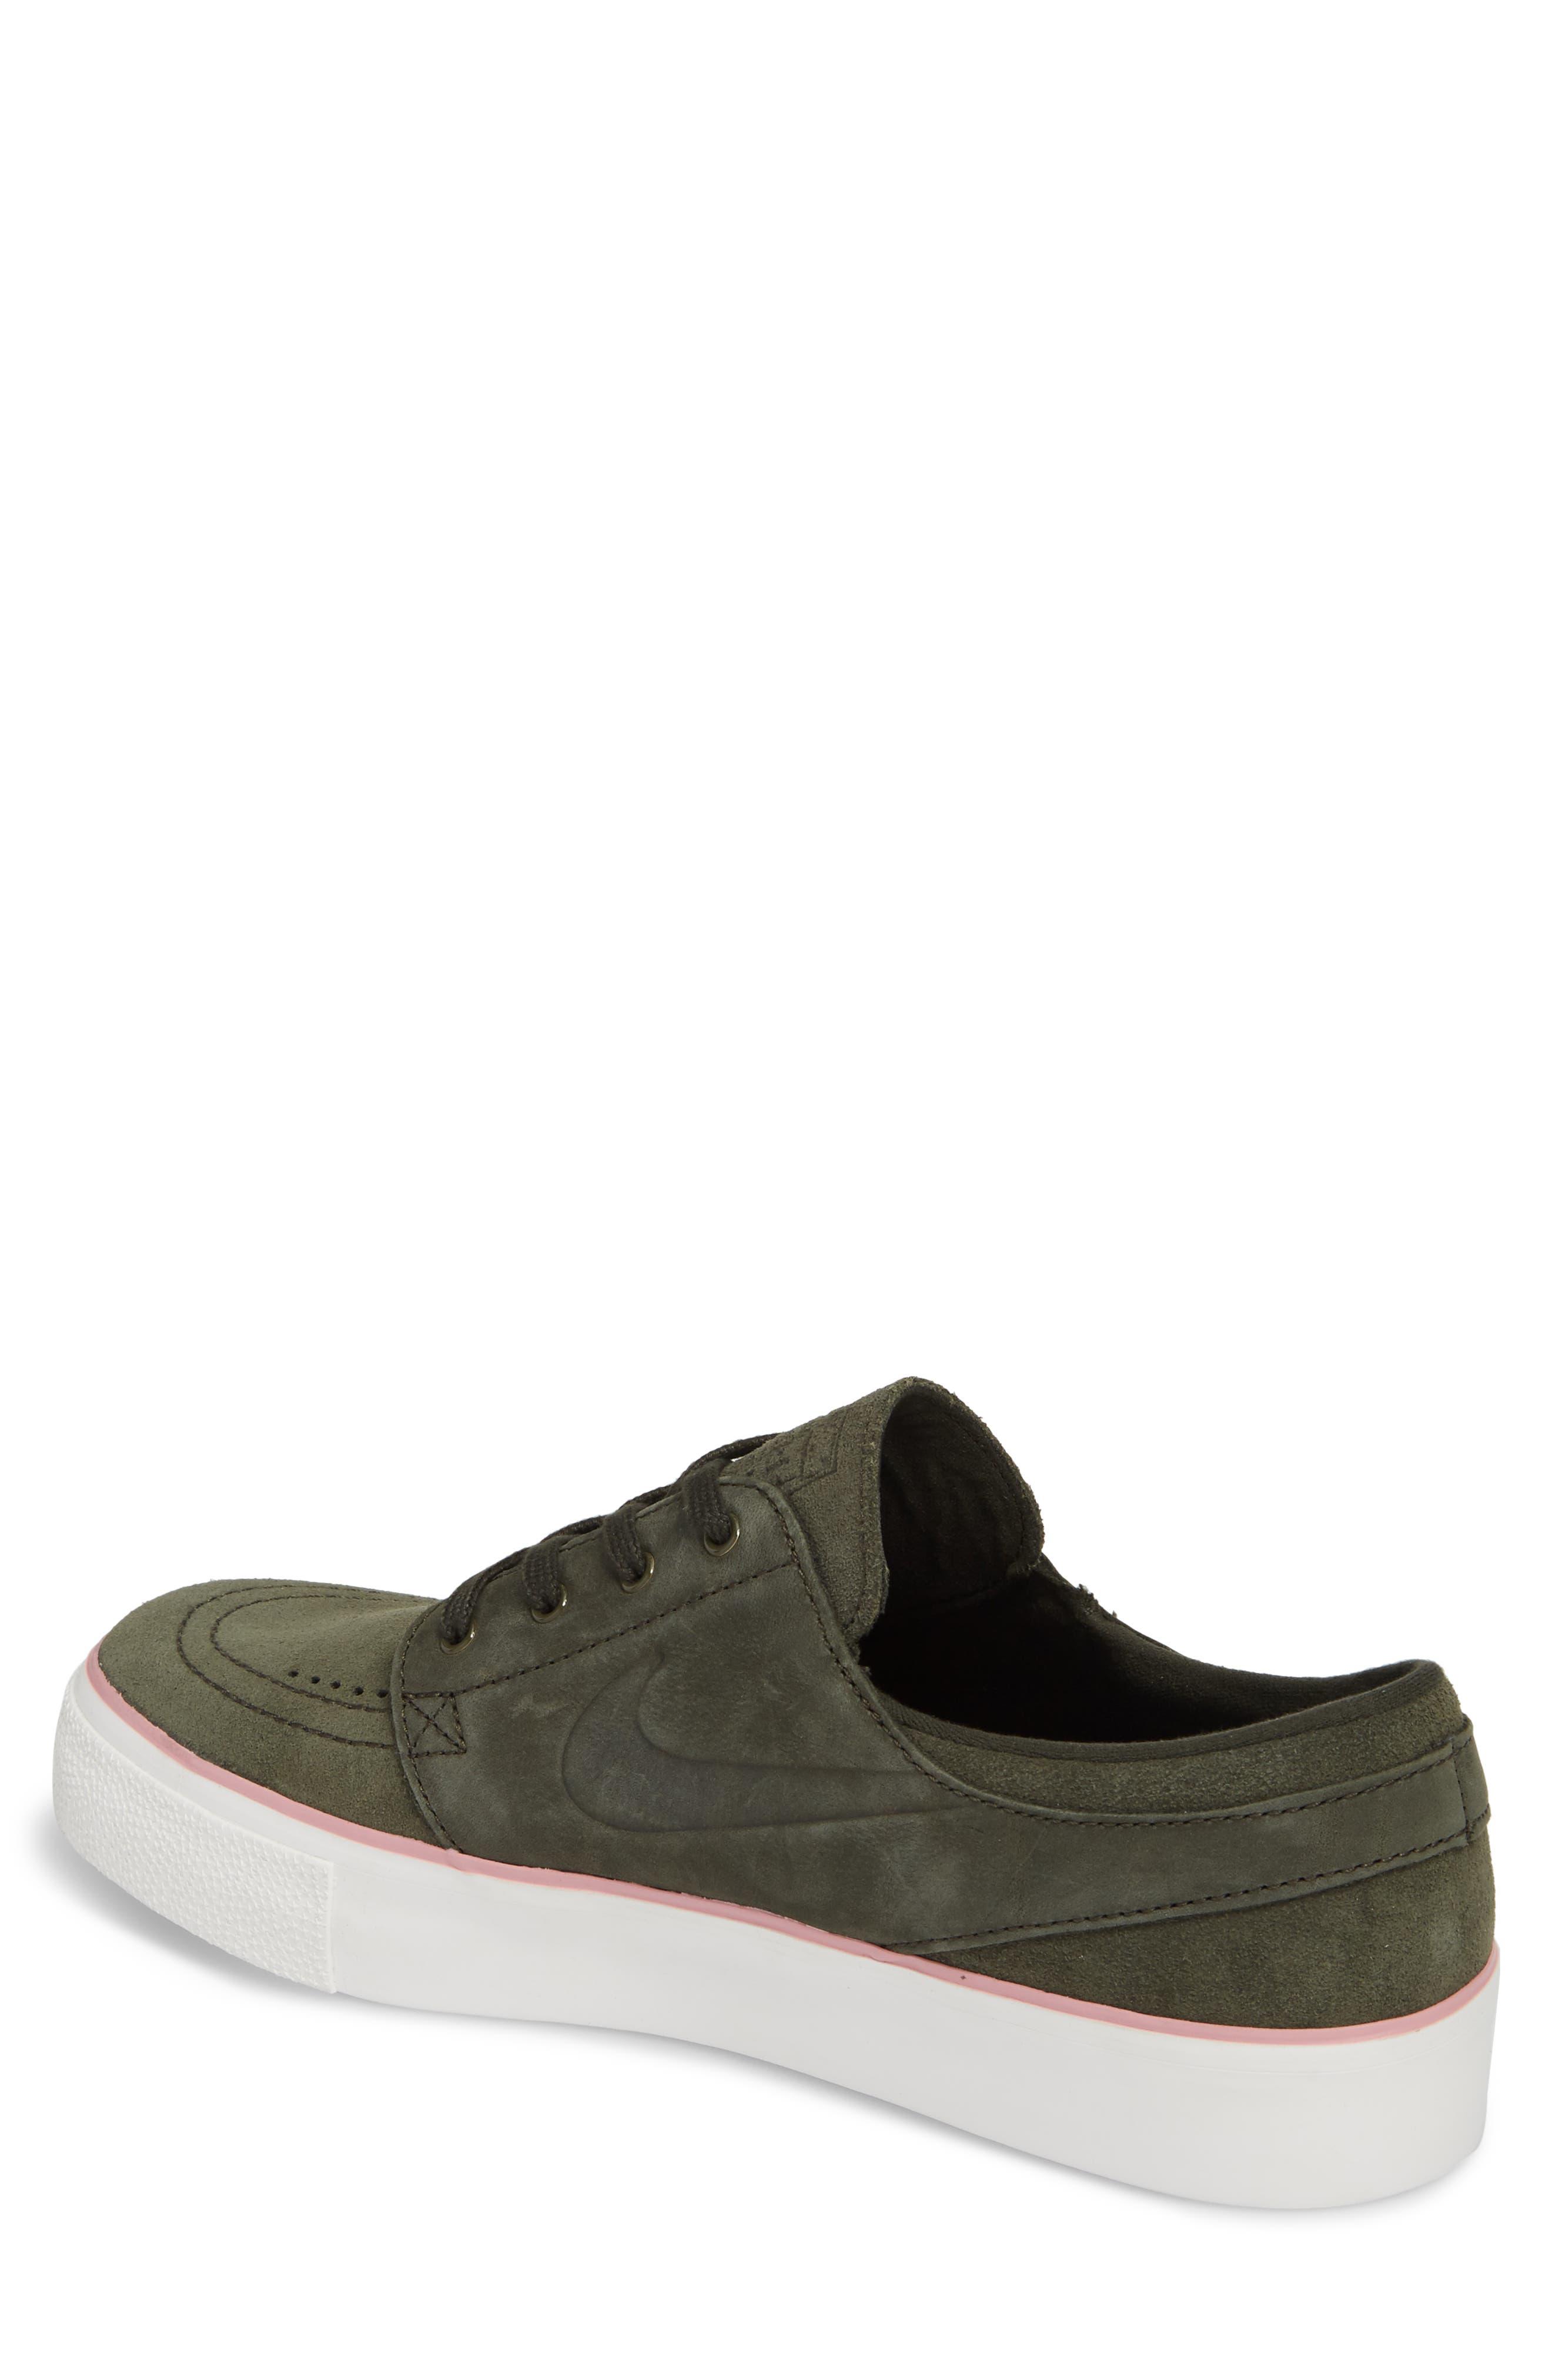 Zoom - Stefan Janoski SB Low Top Sneaker,                             Alternate thumbnail 2, color,                             300